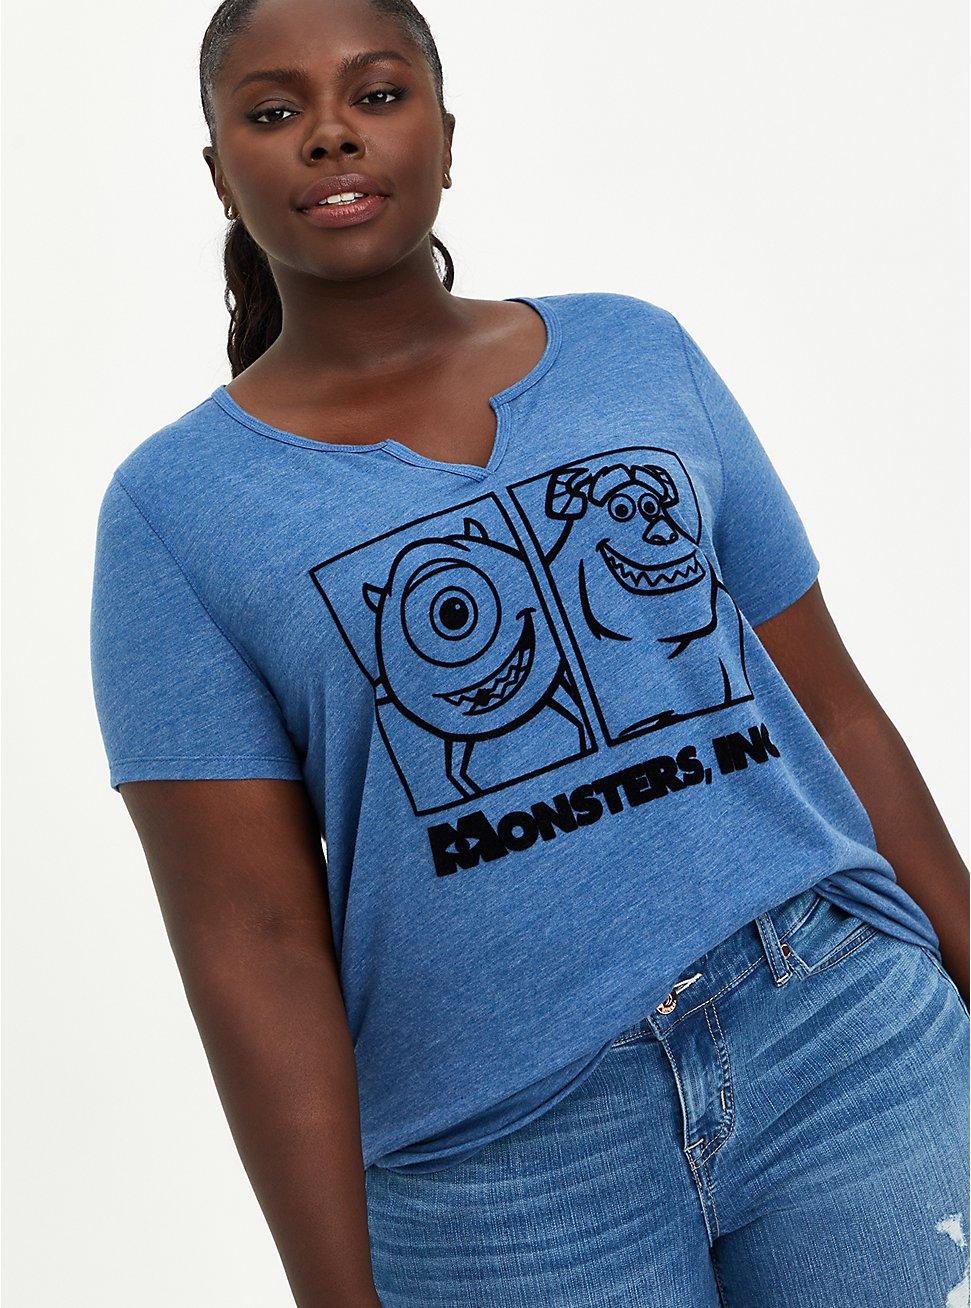 Disney Monsters Inc Mike & Sulley Top, TRUE BLUE, hi-res